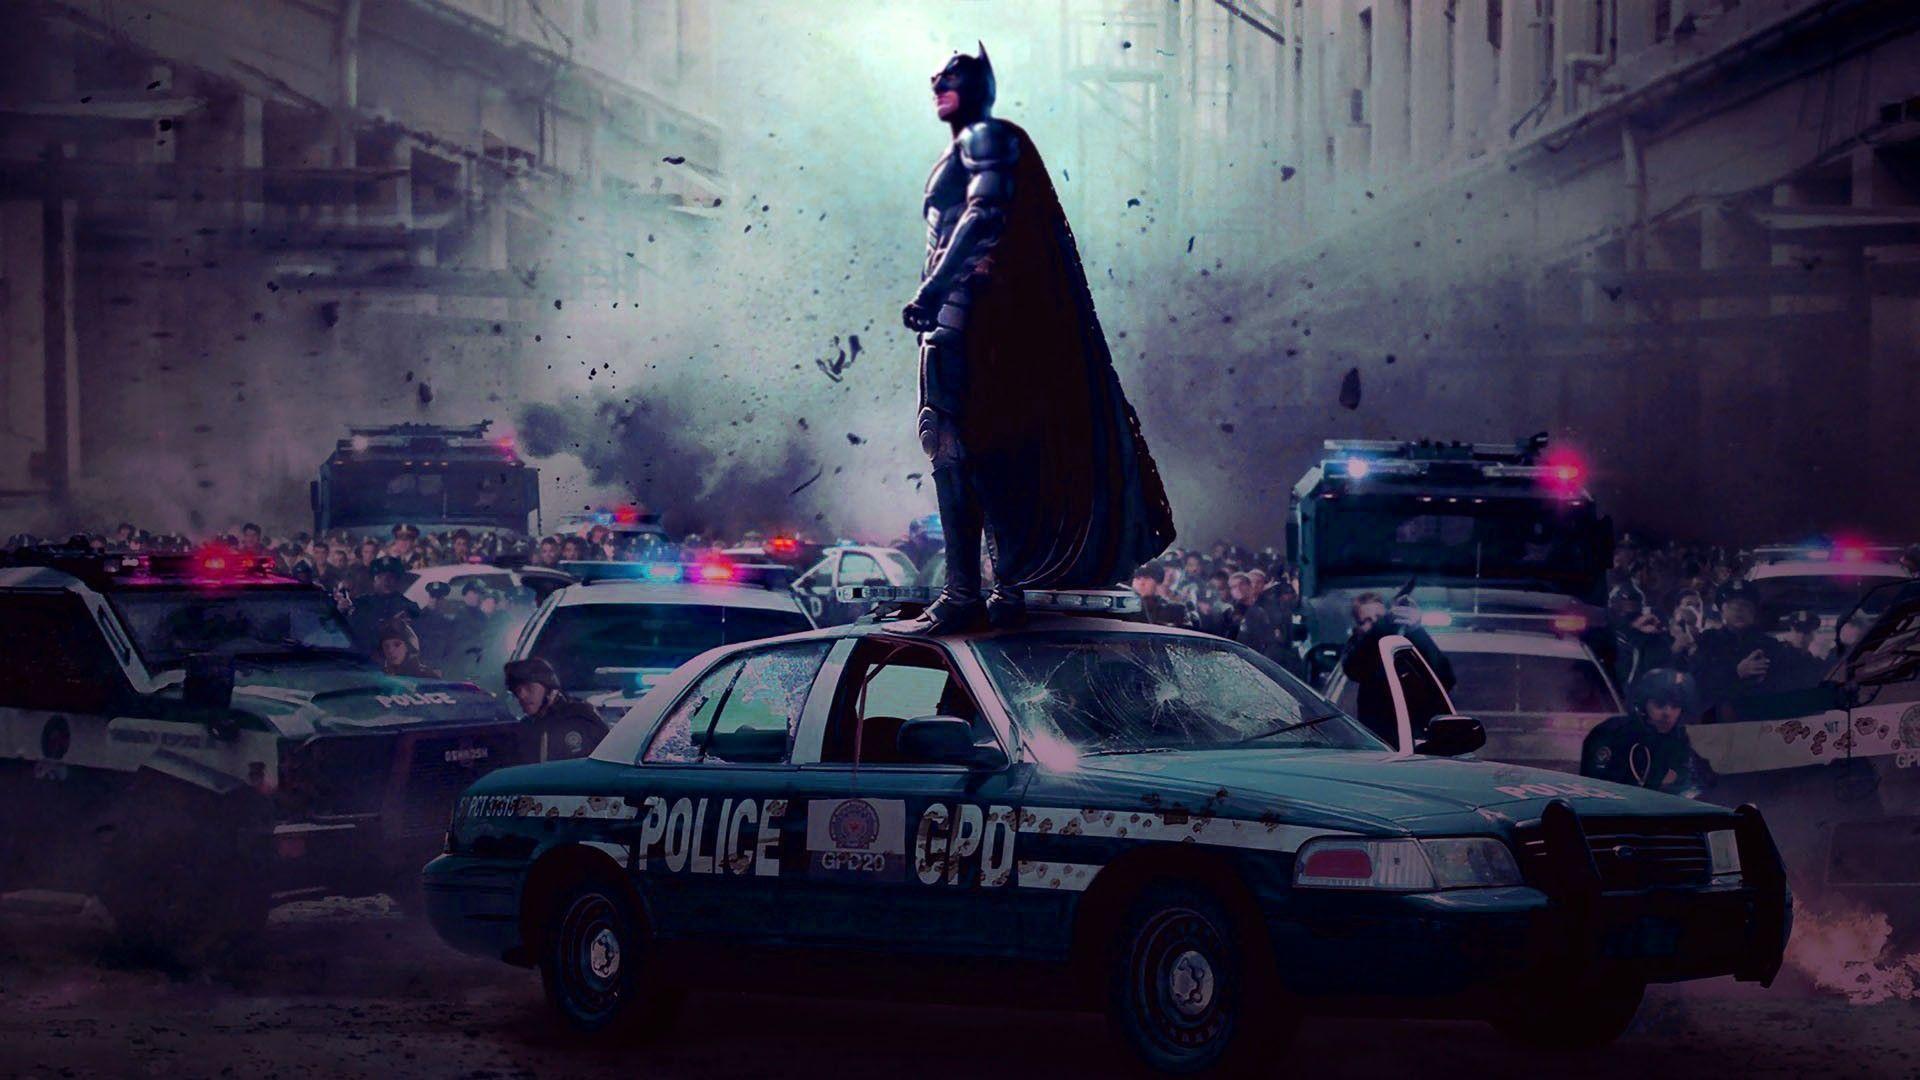 Batman The Dark Knight Car Wallpaper Police Car Wallpapers Wallpaper Cave